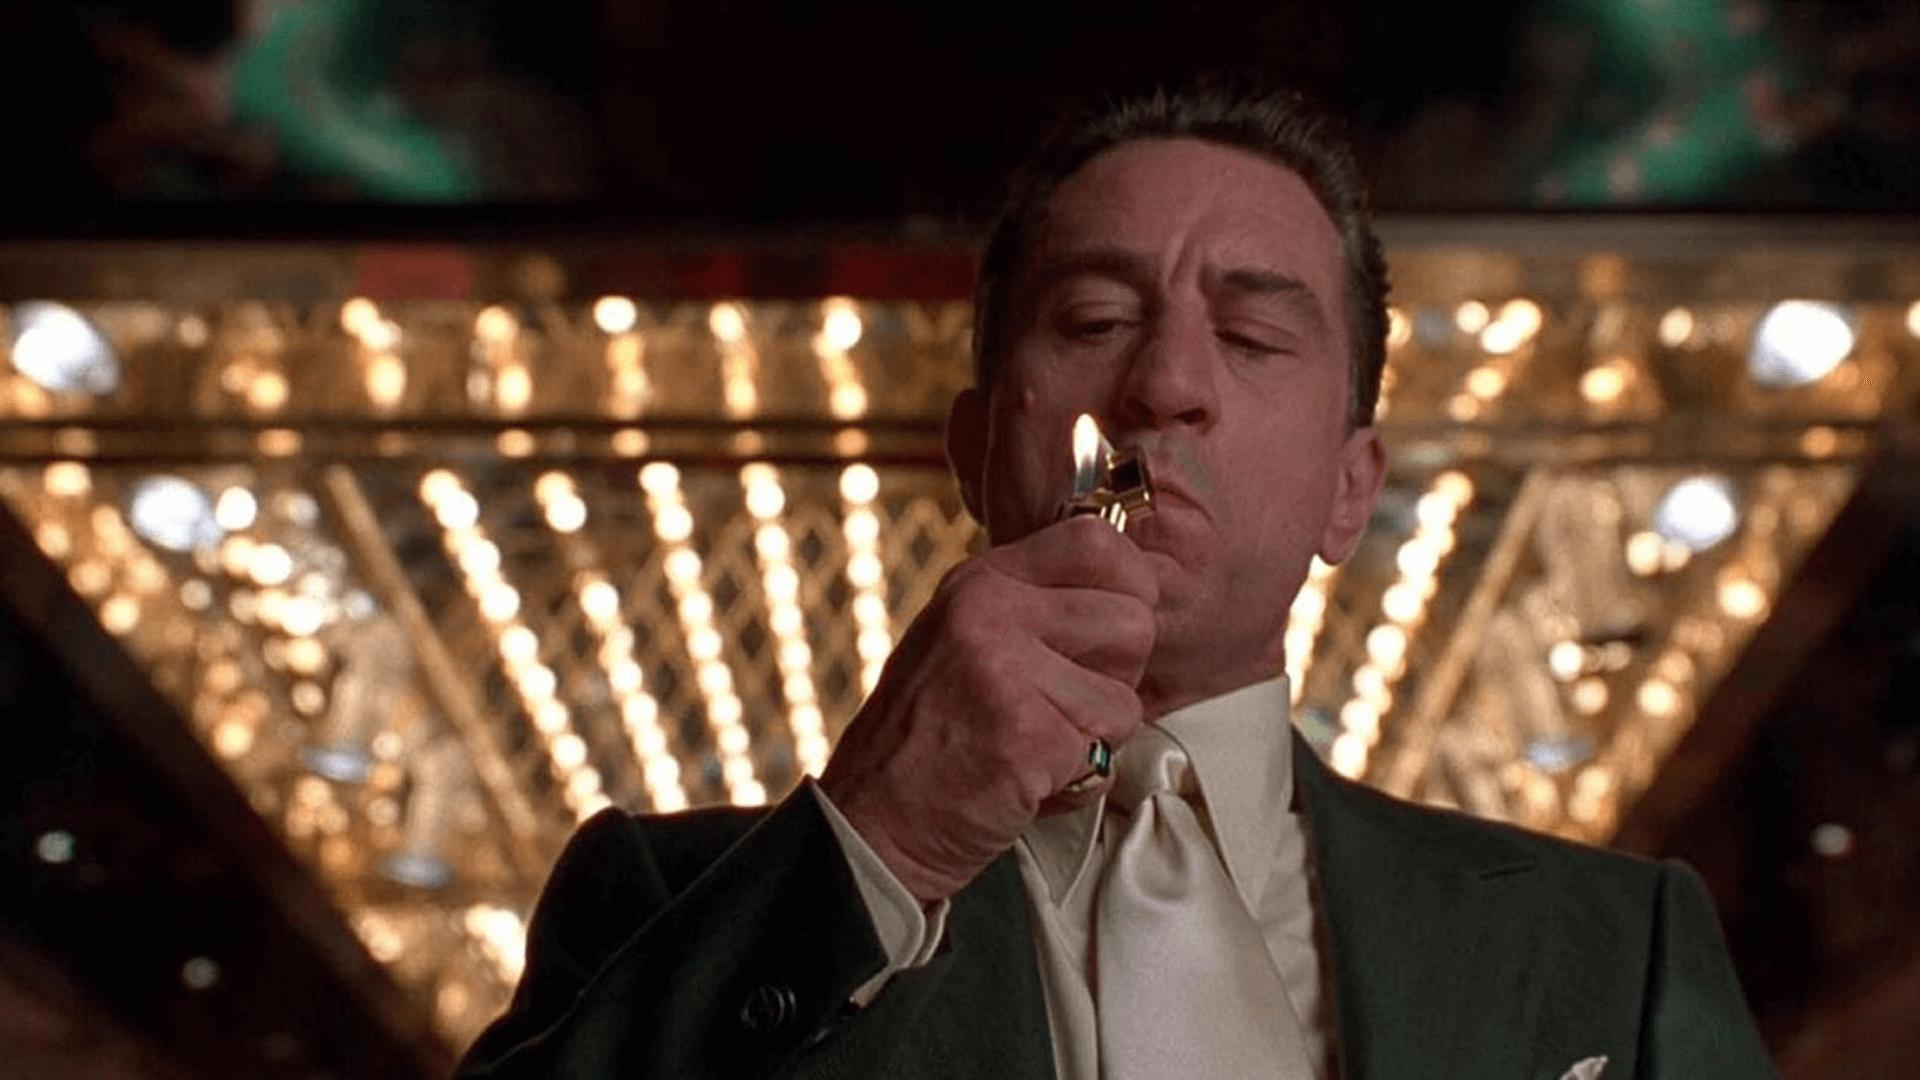 Robert Deniro (Ace) smoking cigaret in front of the Casino